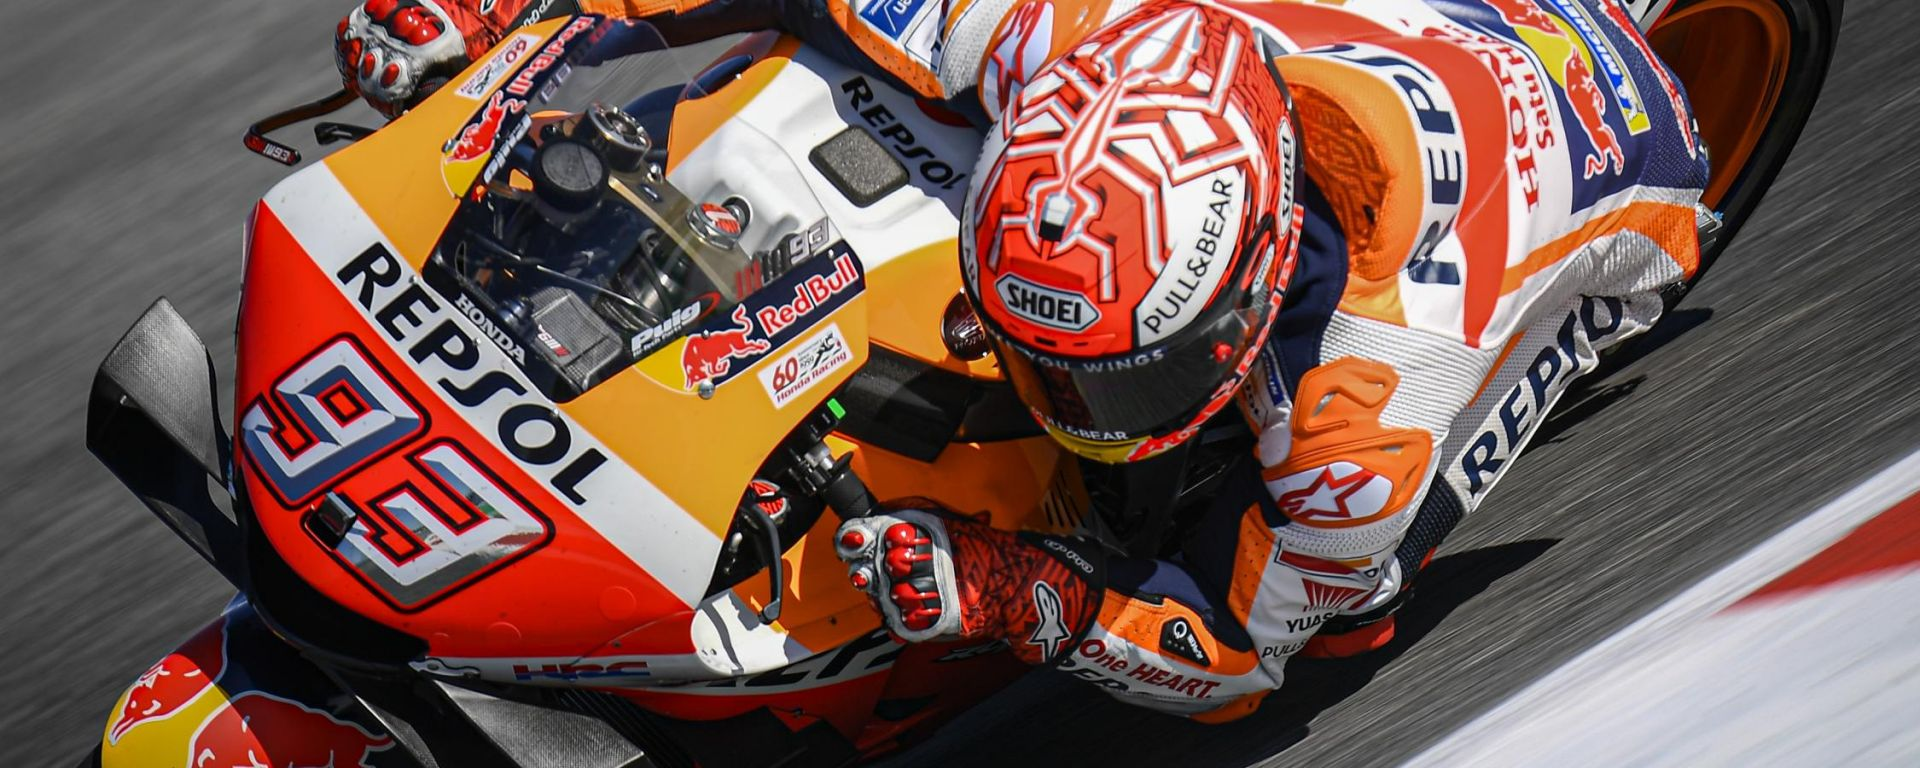 MotoGP San Marino 2019, Misano: Marc Marquez (Honda)